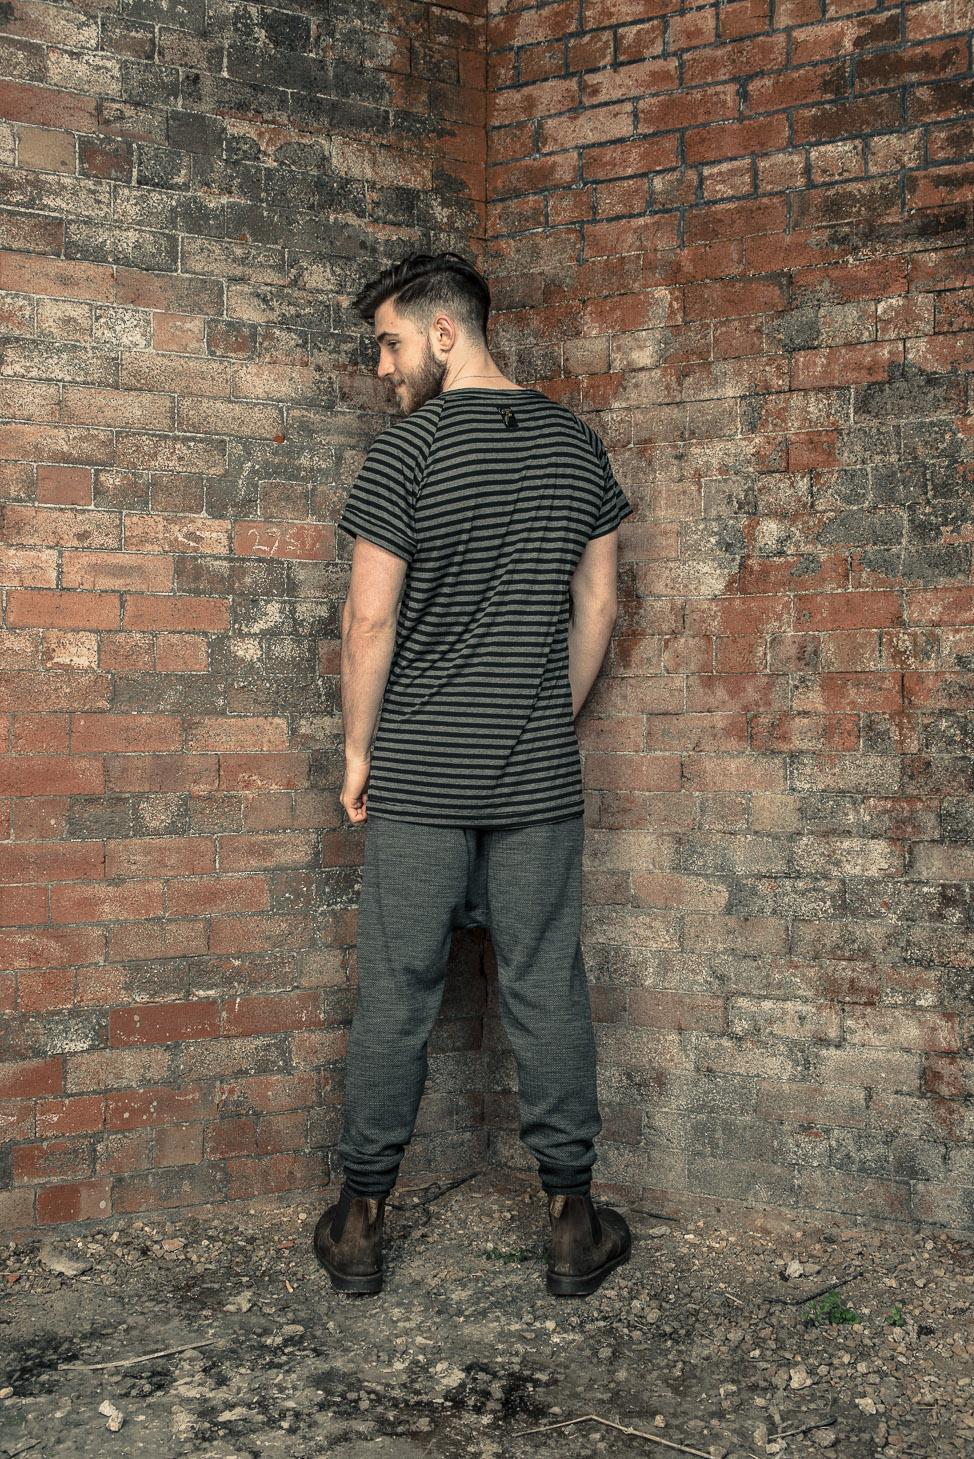 zaramia-ava-zaramiaava-leeds-fashion-designer-ethical-sustainable-tailored-minimalist-stripe-oversized-taichi-raglan-versatile-drape-grey-tshirt-top-vest-hareem-trousers-black-grey-texture-styling-6